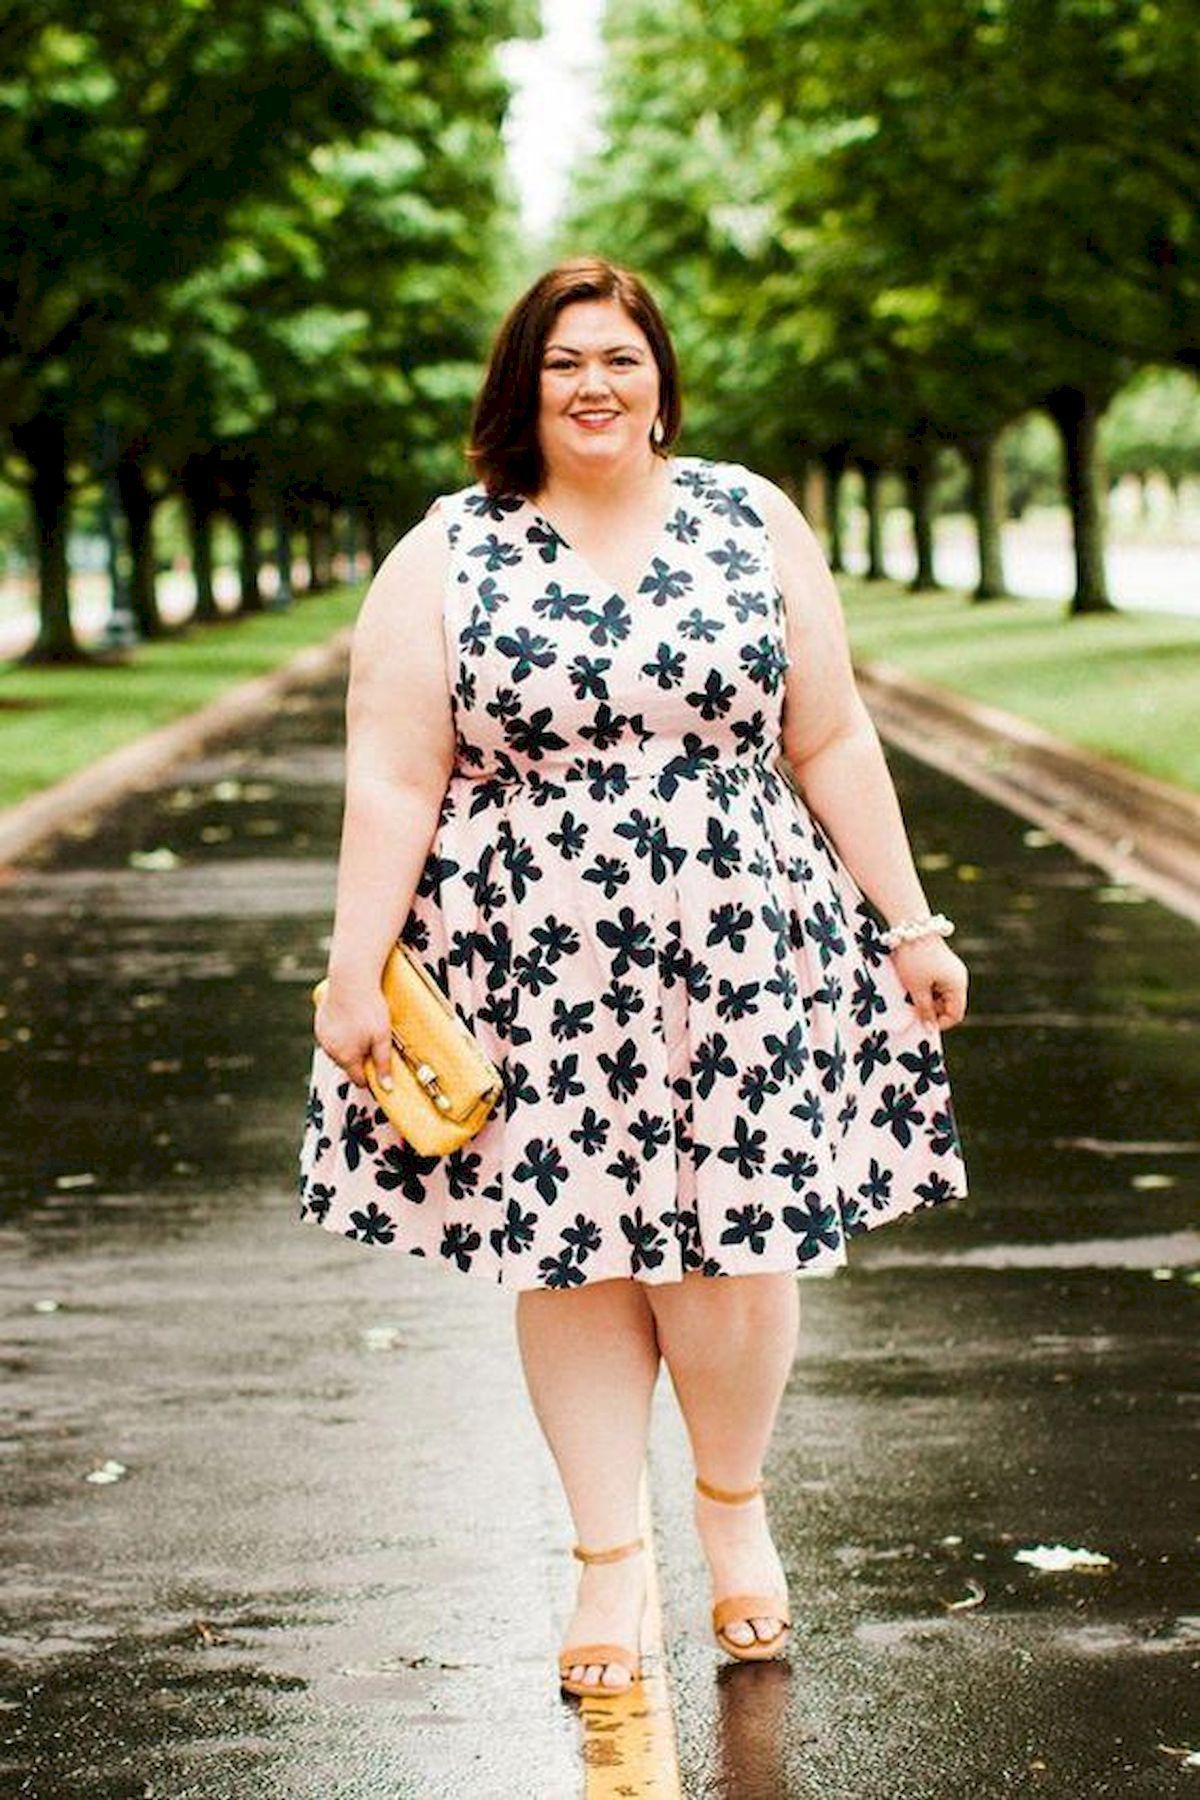 f6d0ea14245 Gorgeous 80 Awesome Plus Size Summer Outfits Ideas source    https   trendingofashion.